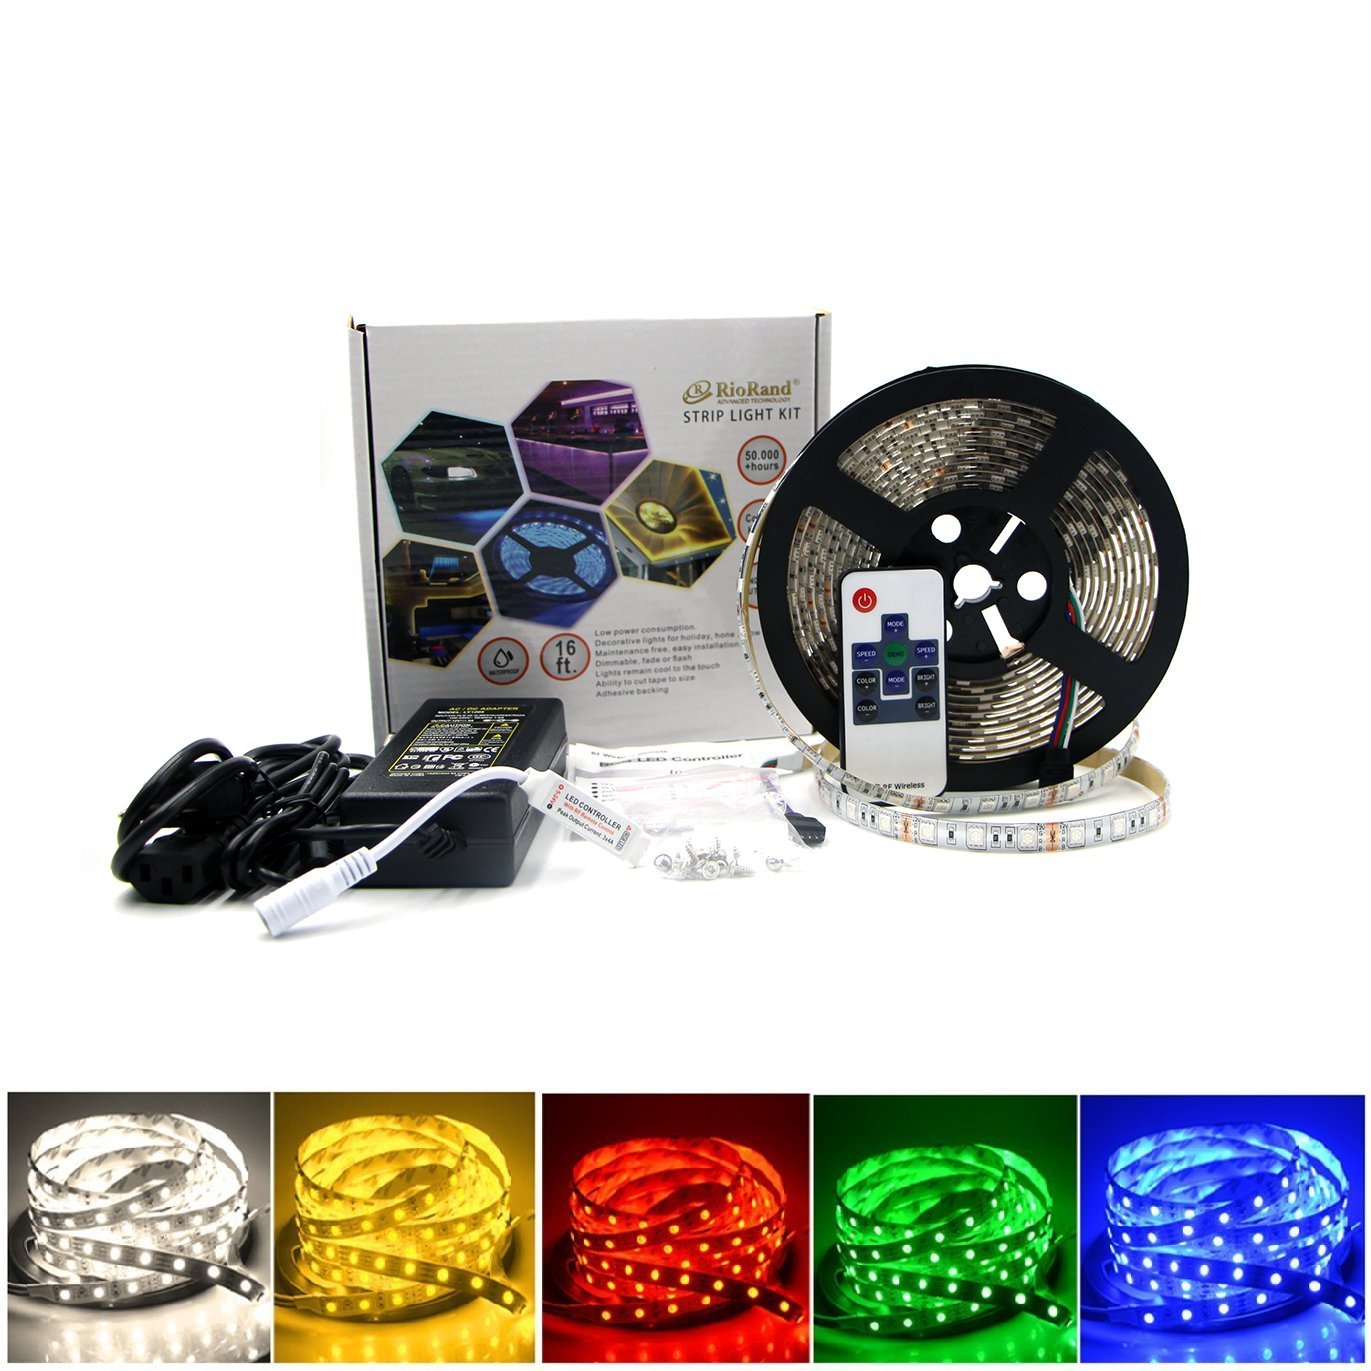 RioRand LED Strip Light waterproof Outdoor WRGB Kit RF Remote Controller 300LEDs 16.4 Feet SMD 5050 Flexible lighting RR-LS-FR-CC